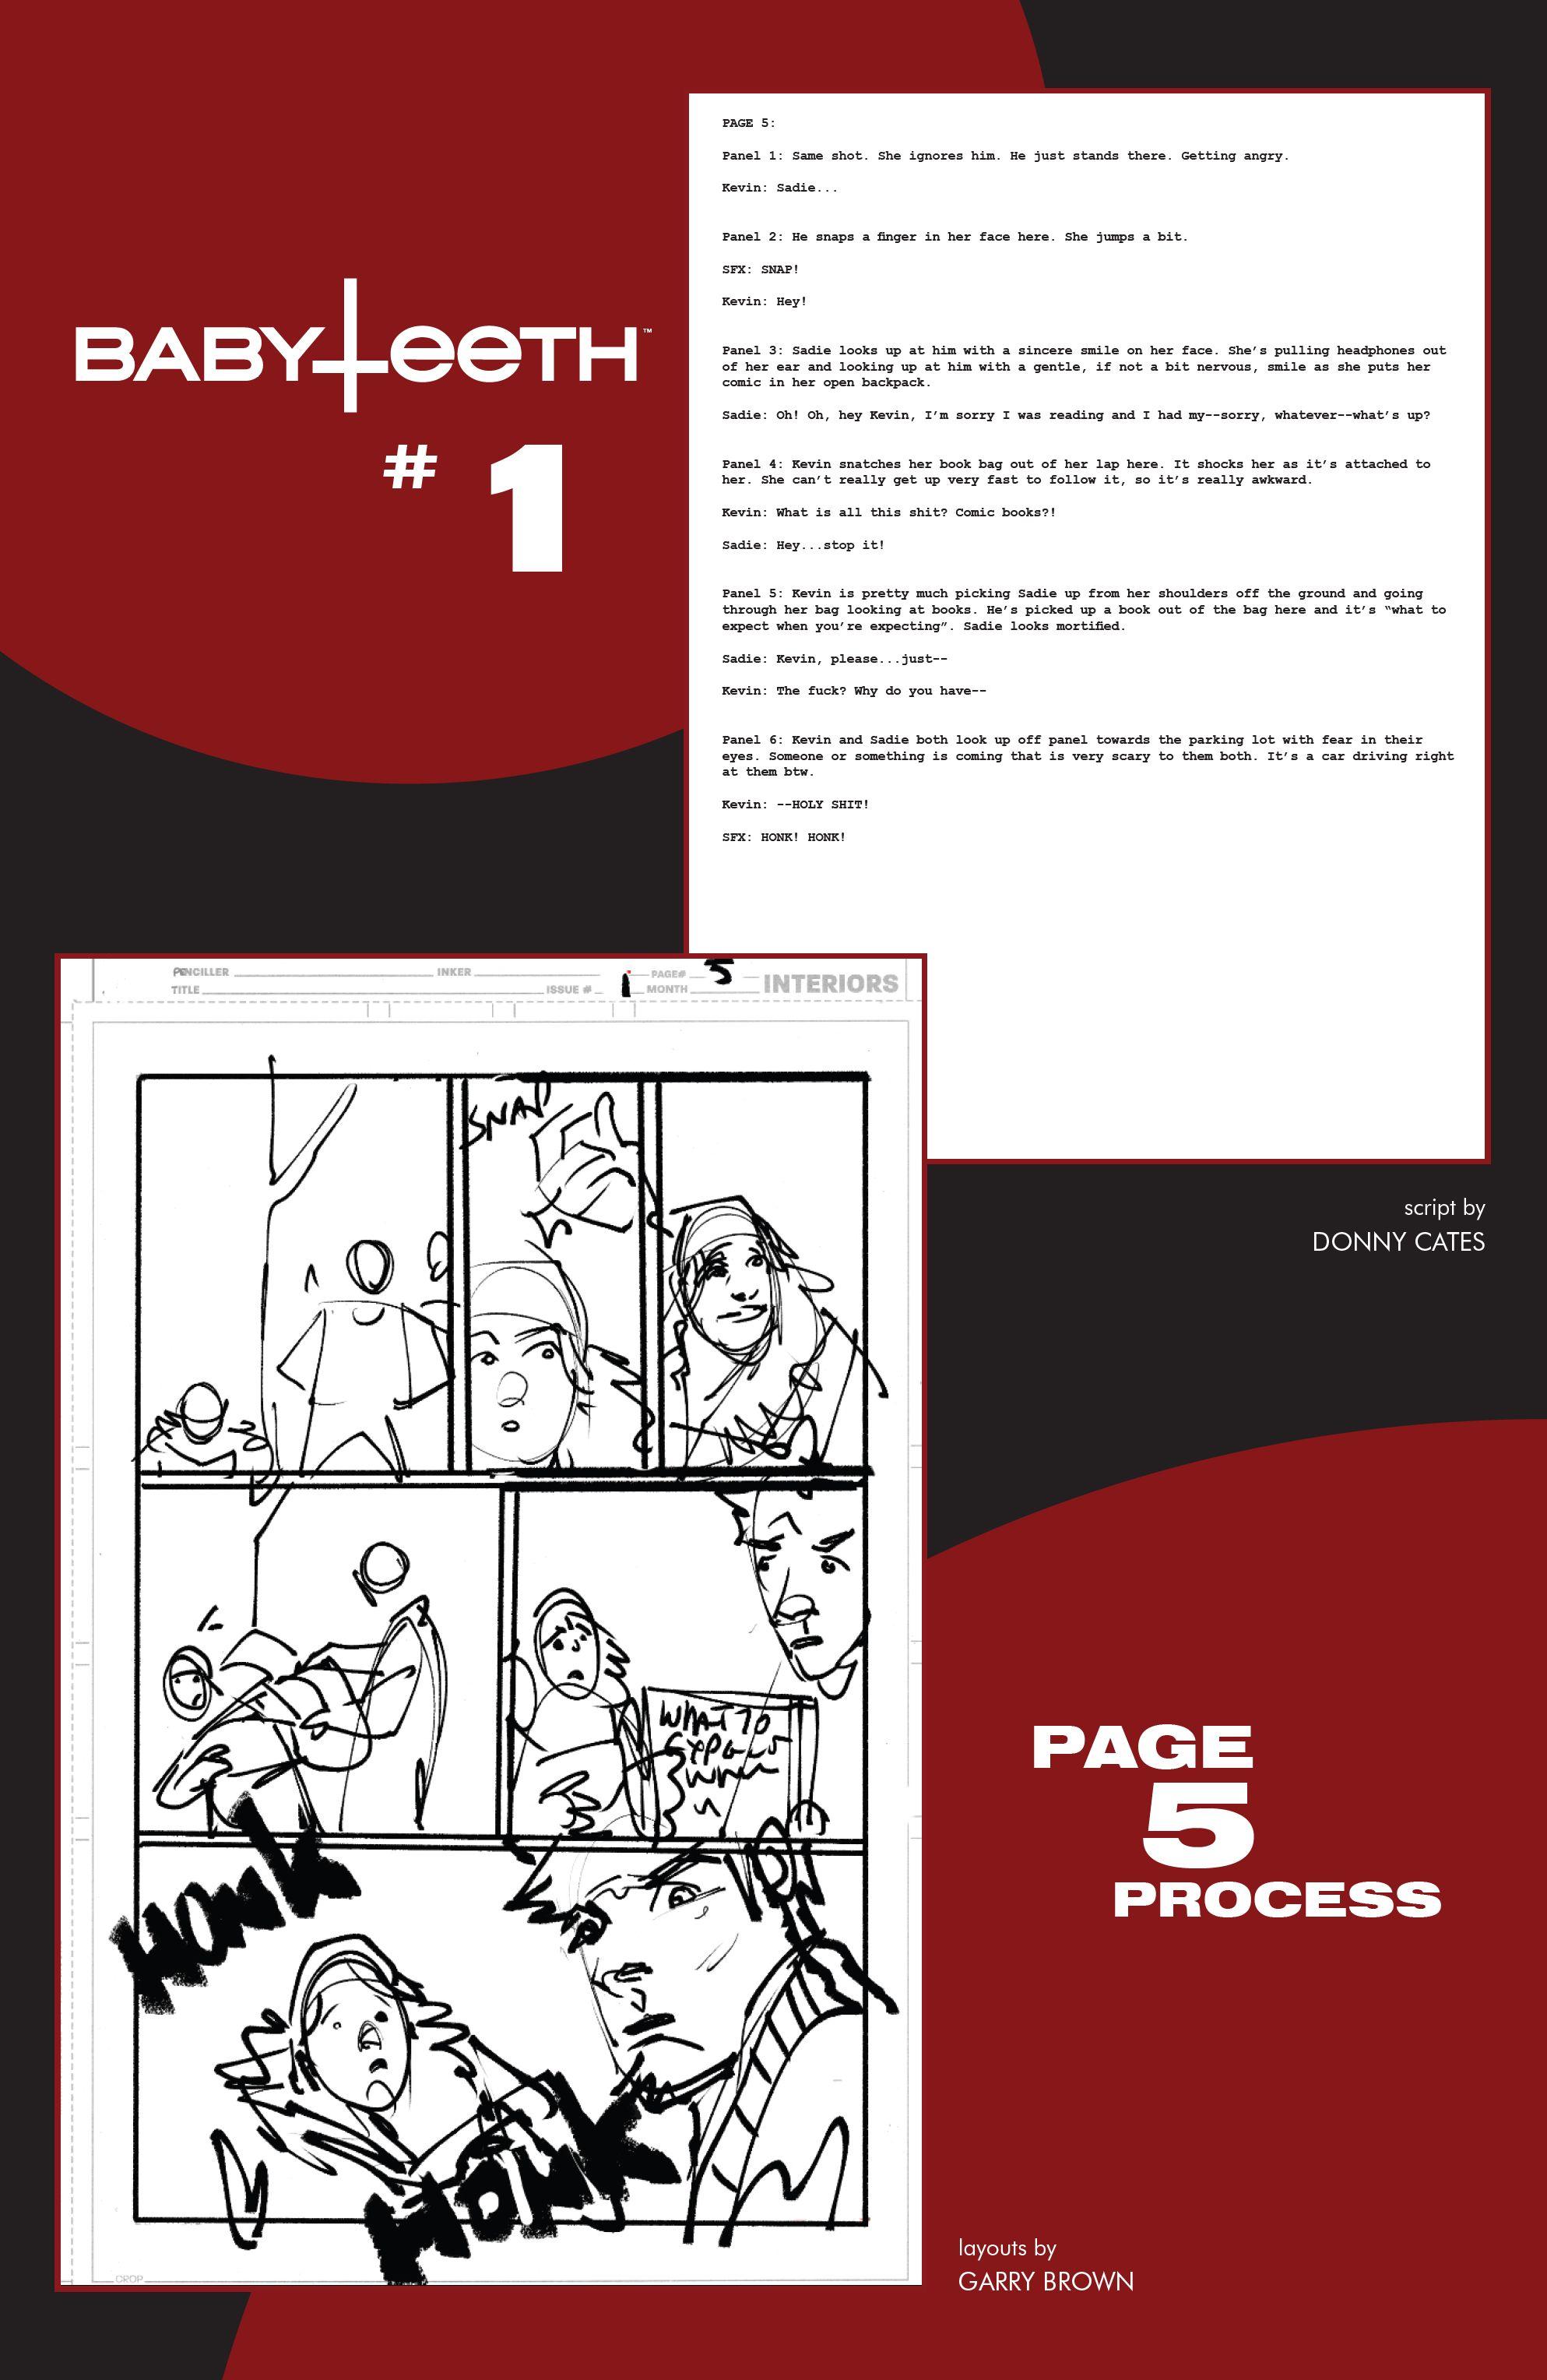 Read online Babyteeth comic -  Issue #1 - 24